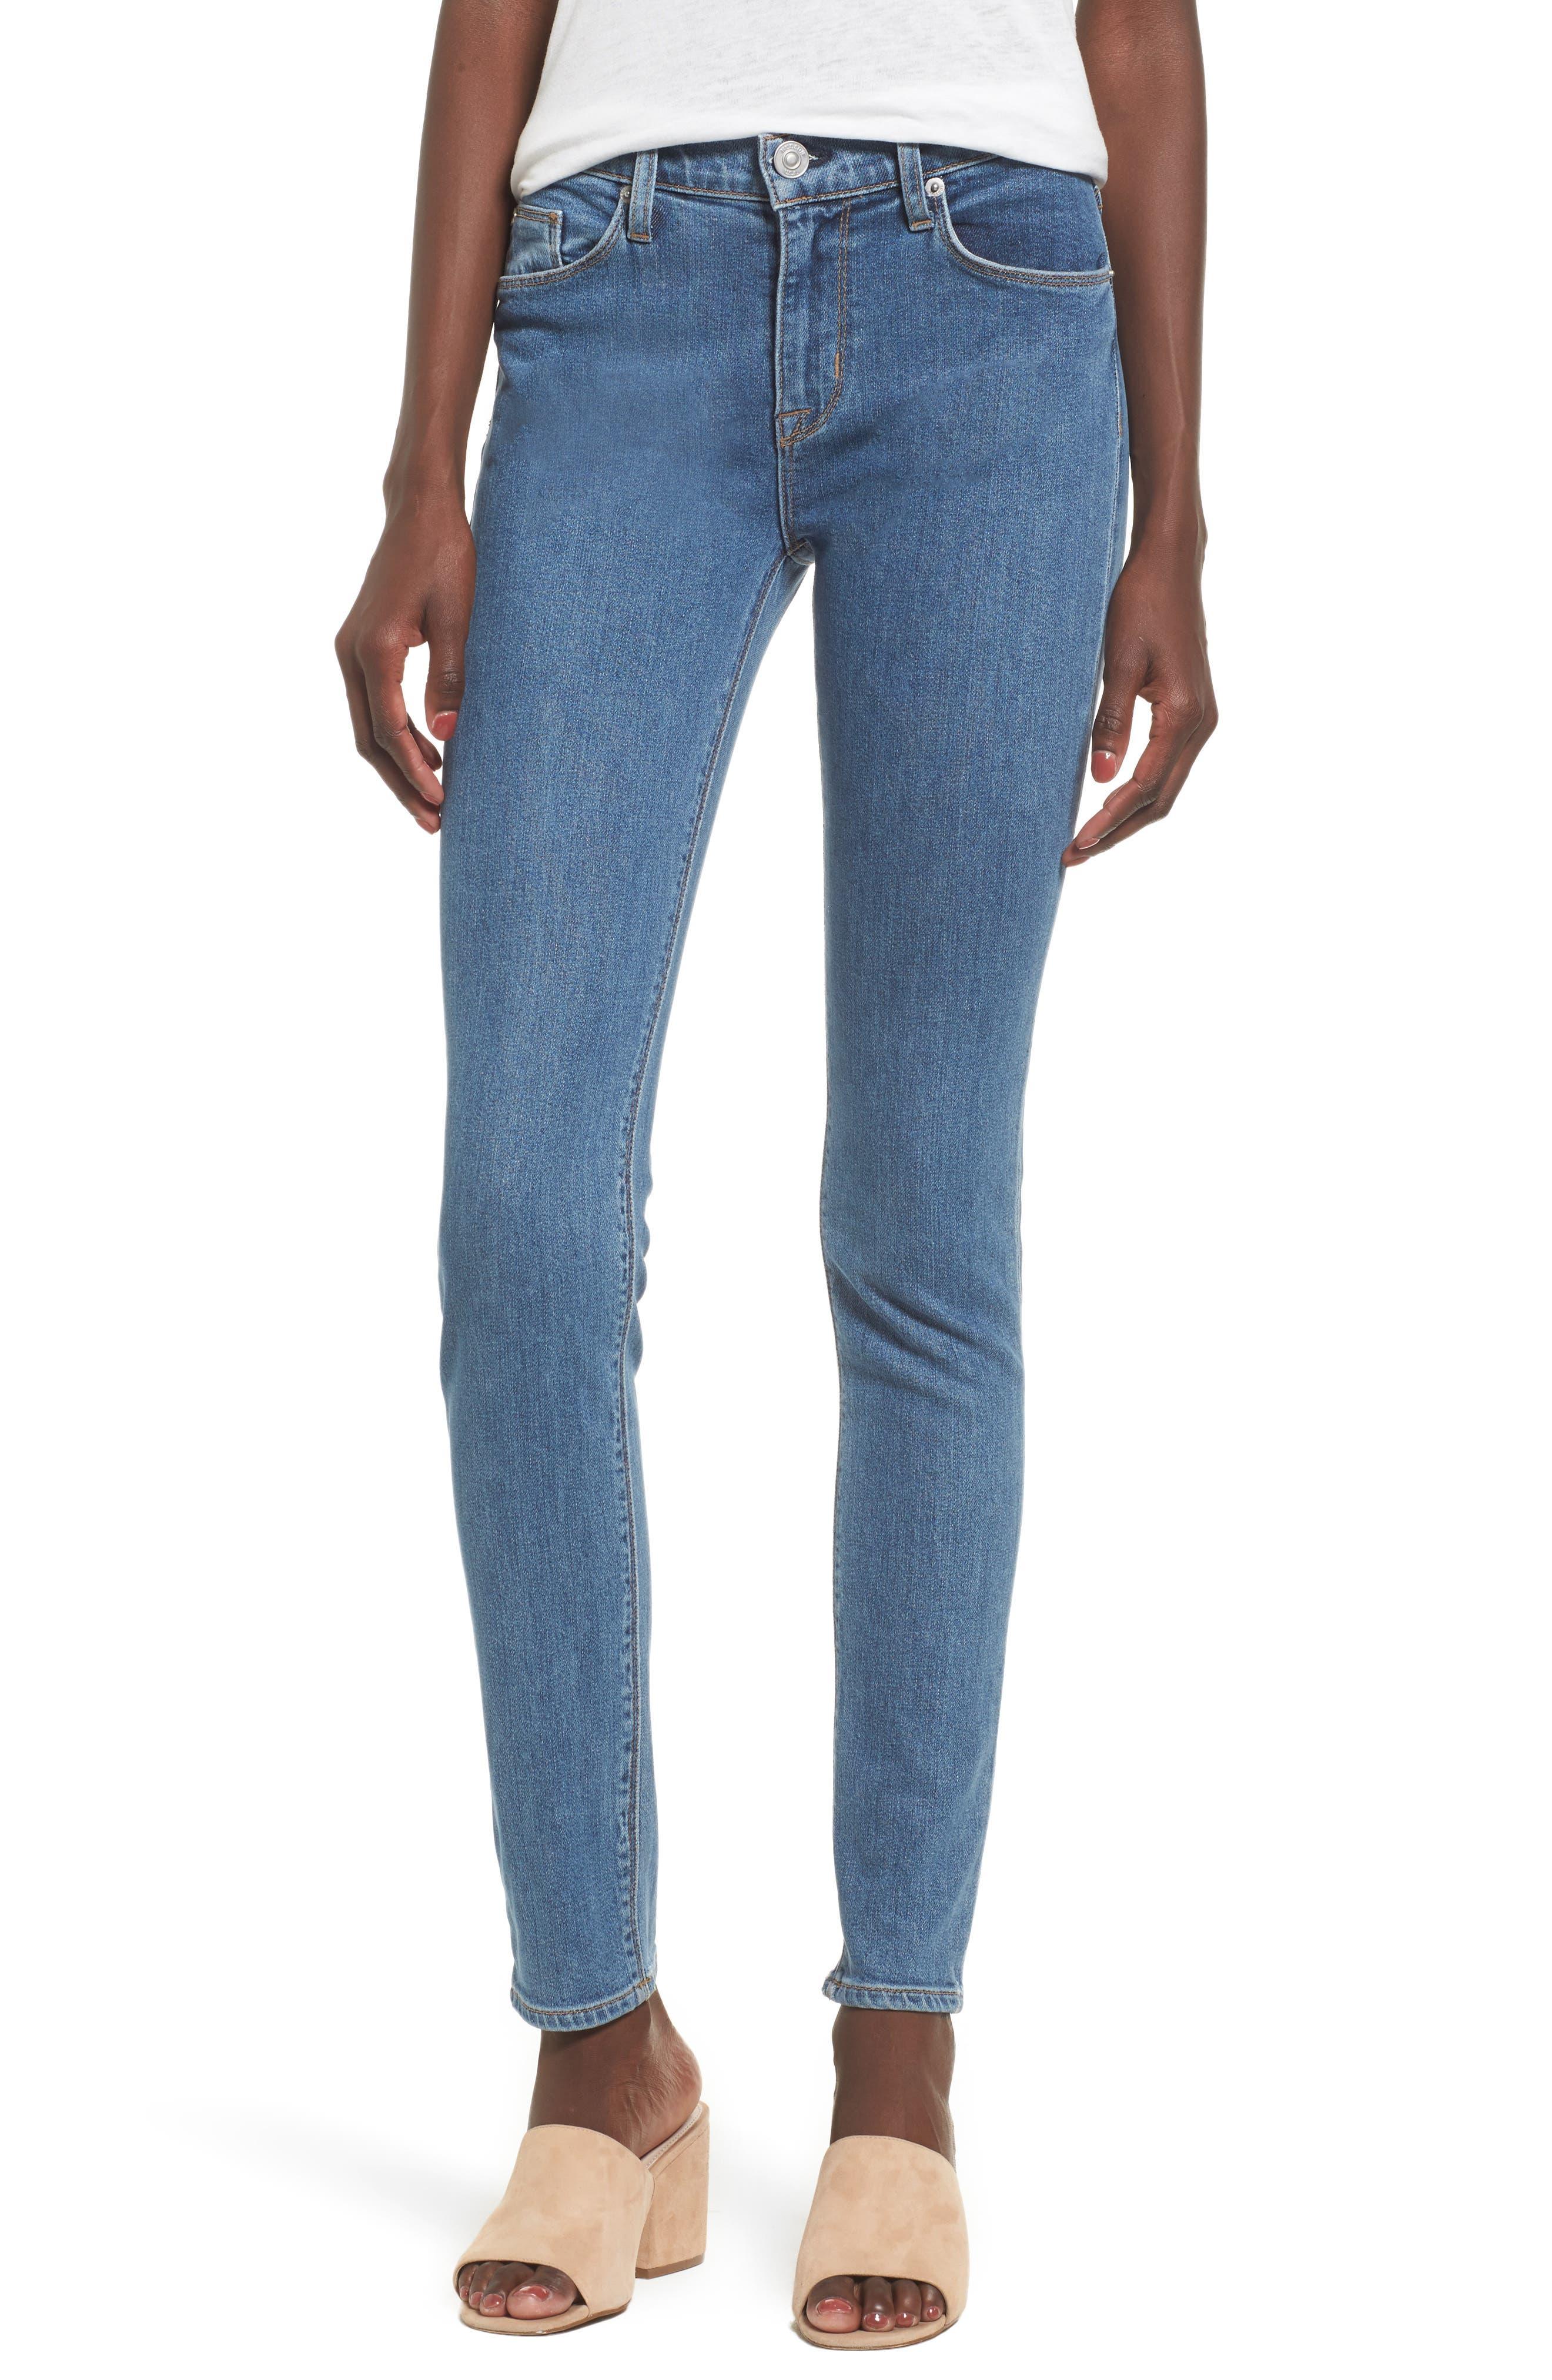 Main Image - Hudson Jeans Nico Shredded Skinny Jeans